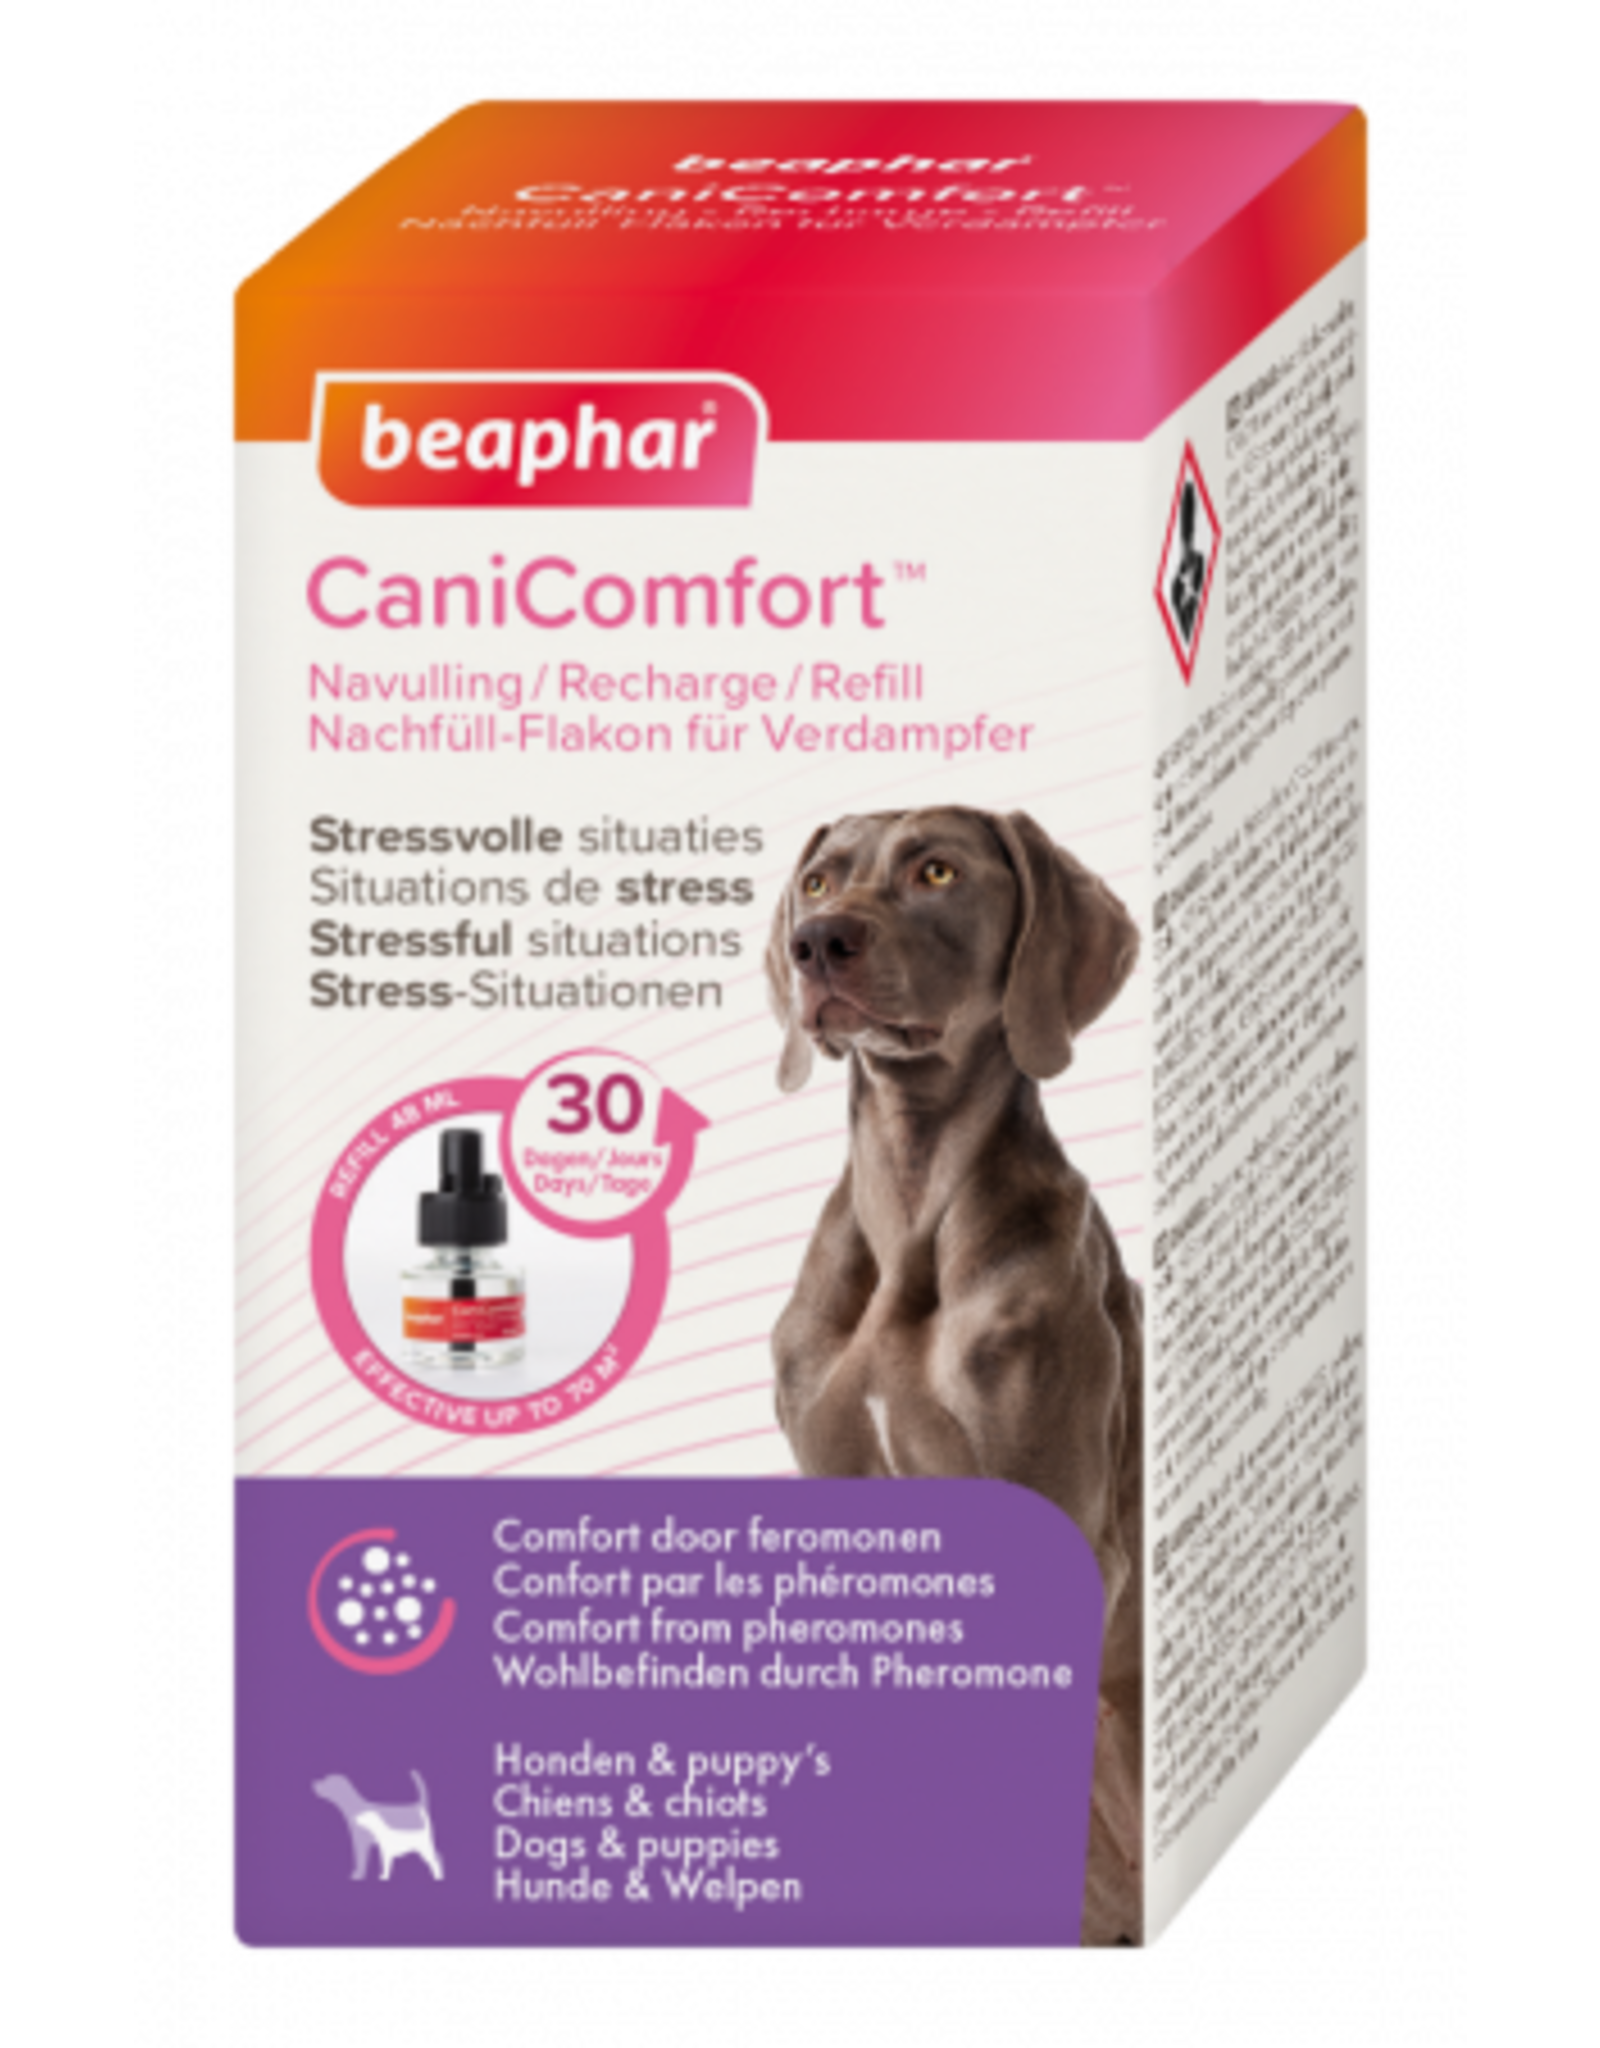 Beaphar CaniComfort Dog Calming Diffuser, 30 Day Refill